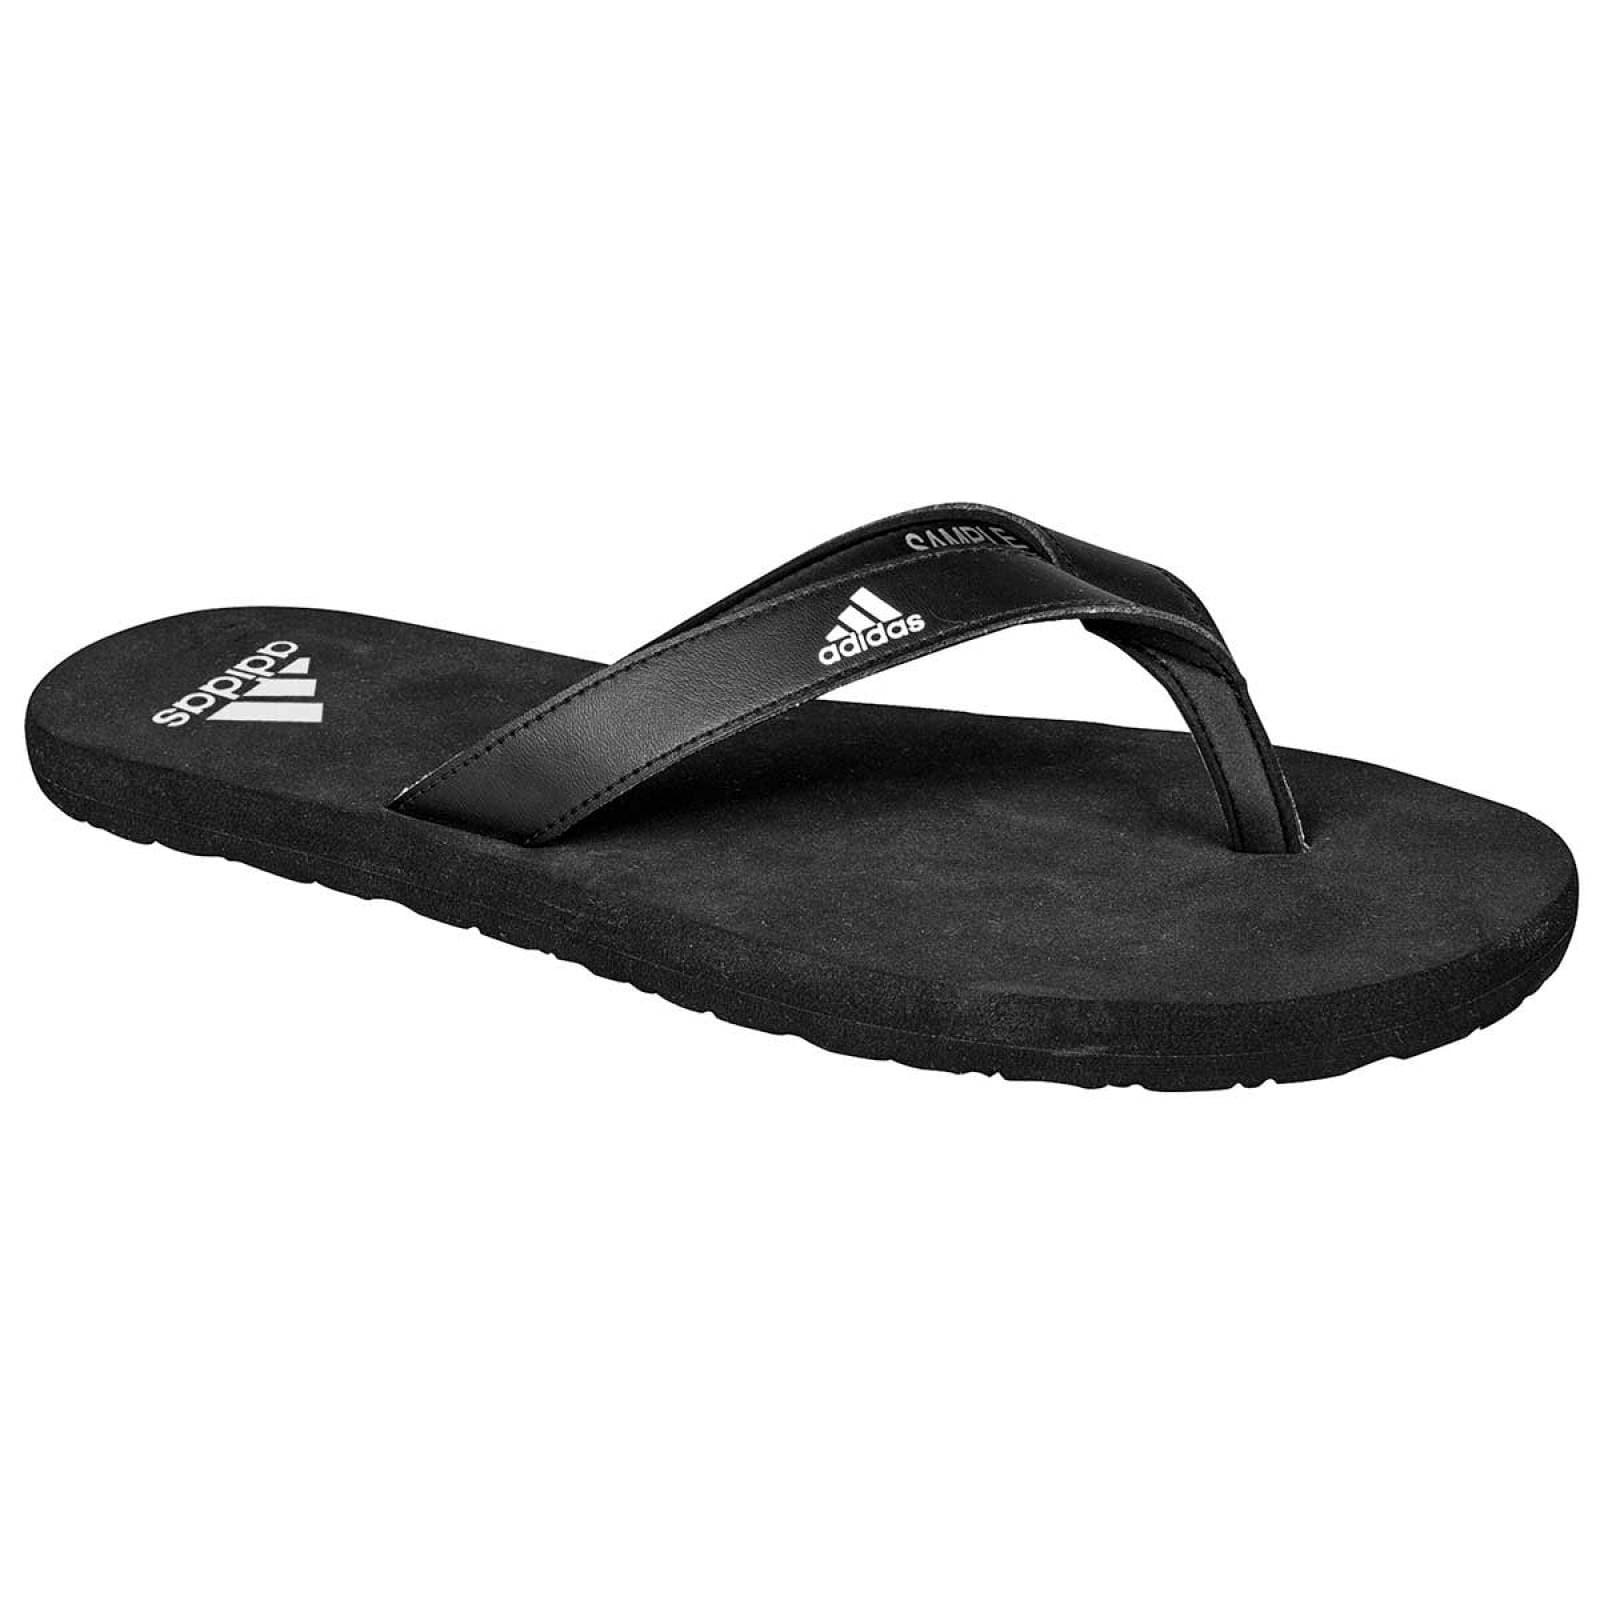 Adidas Sandalia Hombre Negro eezay flip flop